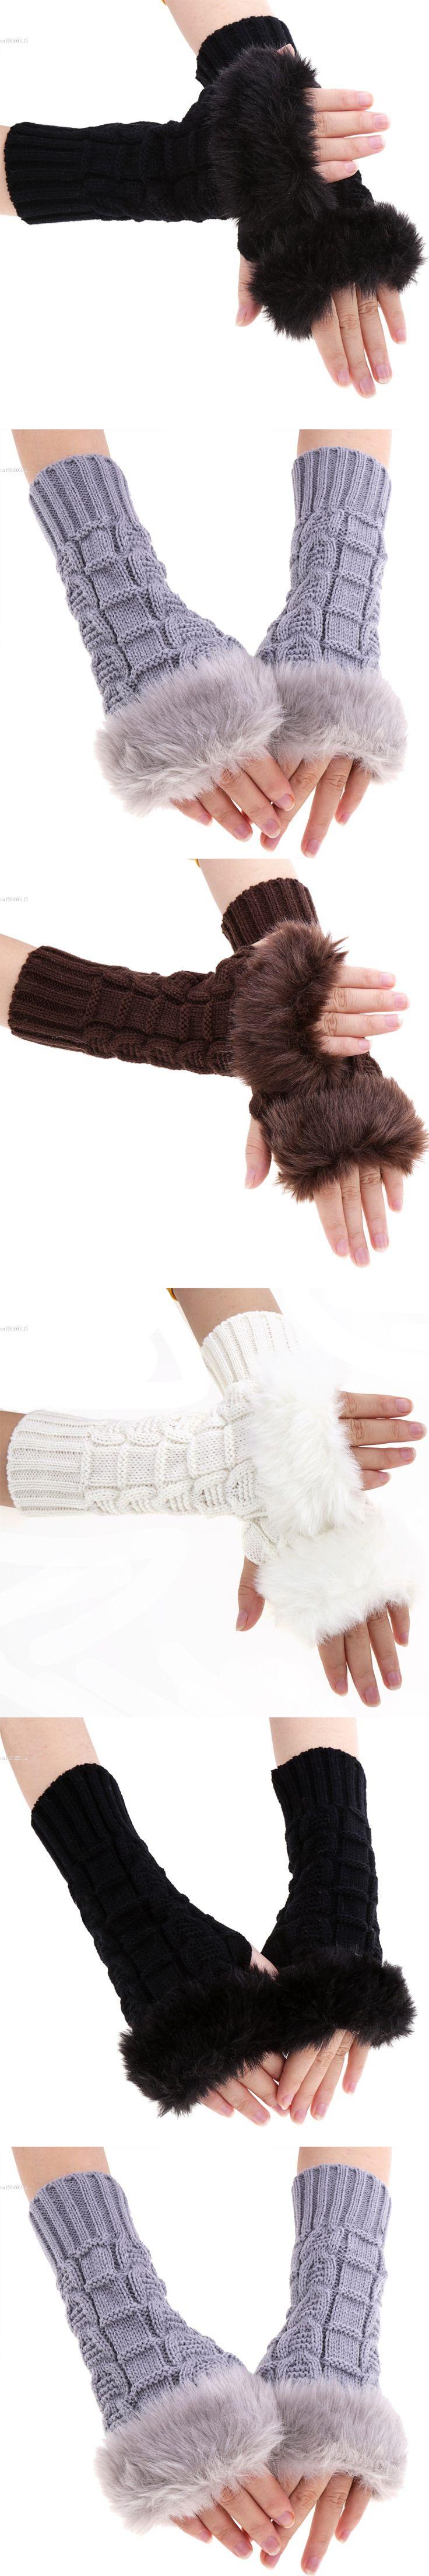 High Quaity Faux Fur Fingerless Gloves Women Knitted Gloves Warm Winter Half Finger Cuff Gloves Women Wrist Winter Long Mittens